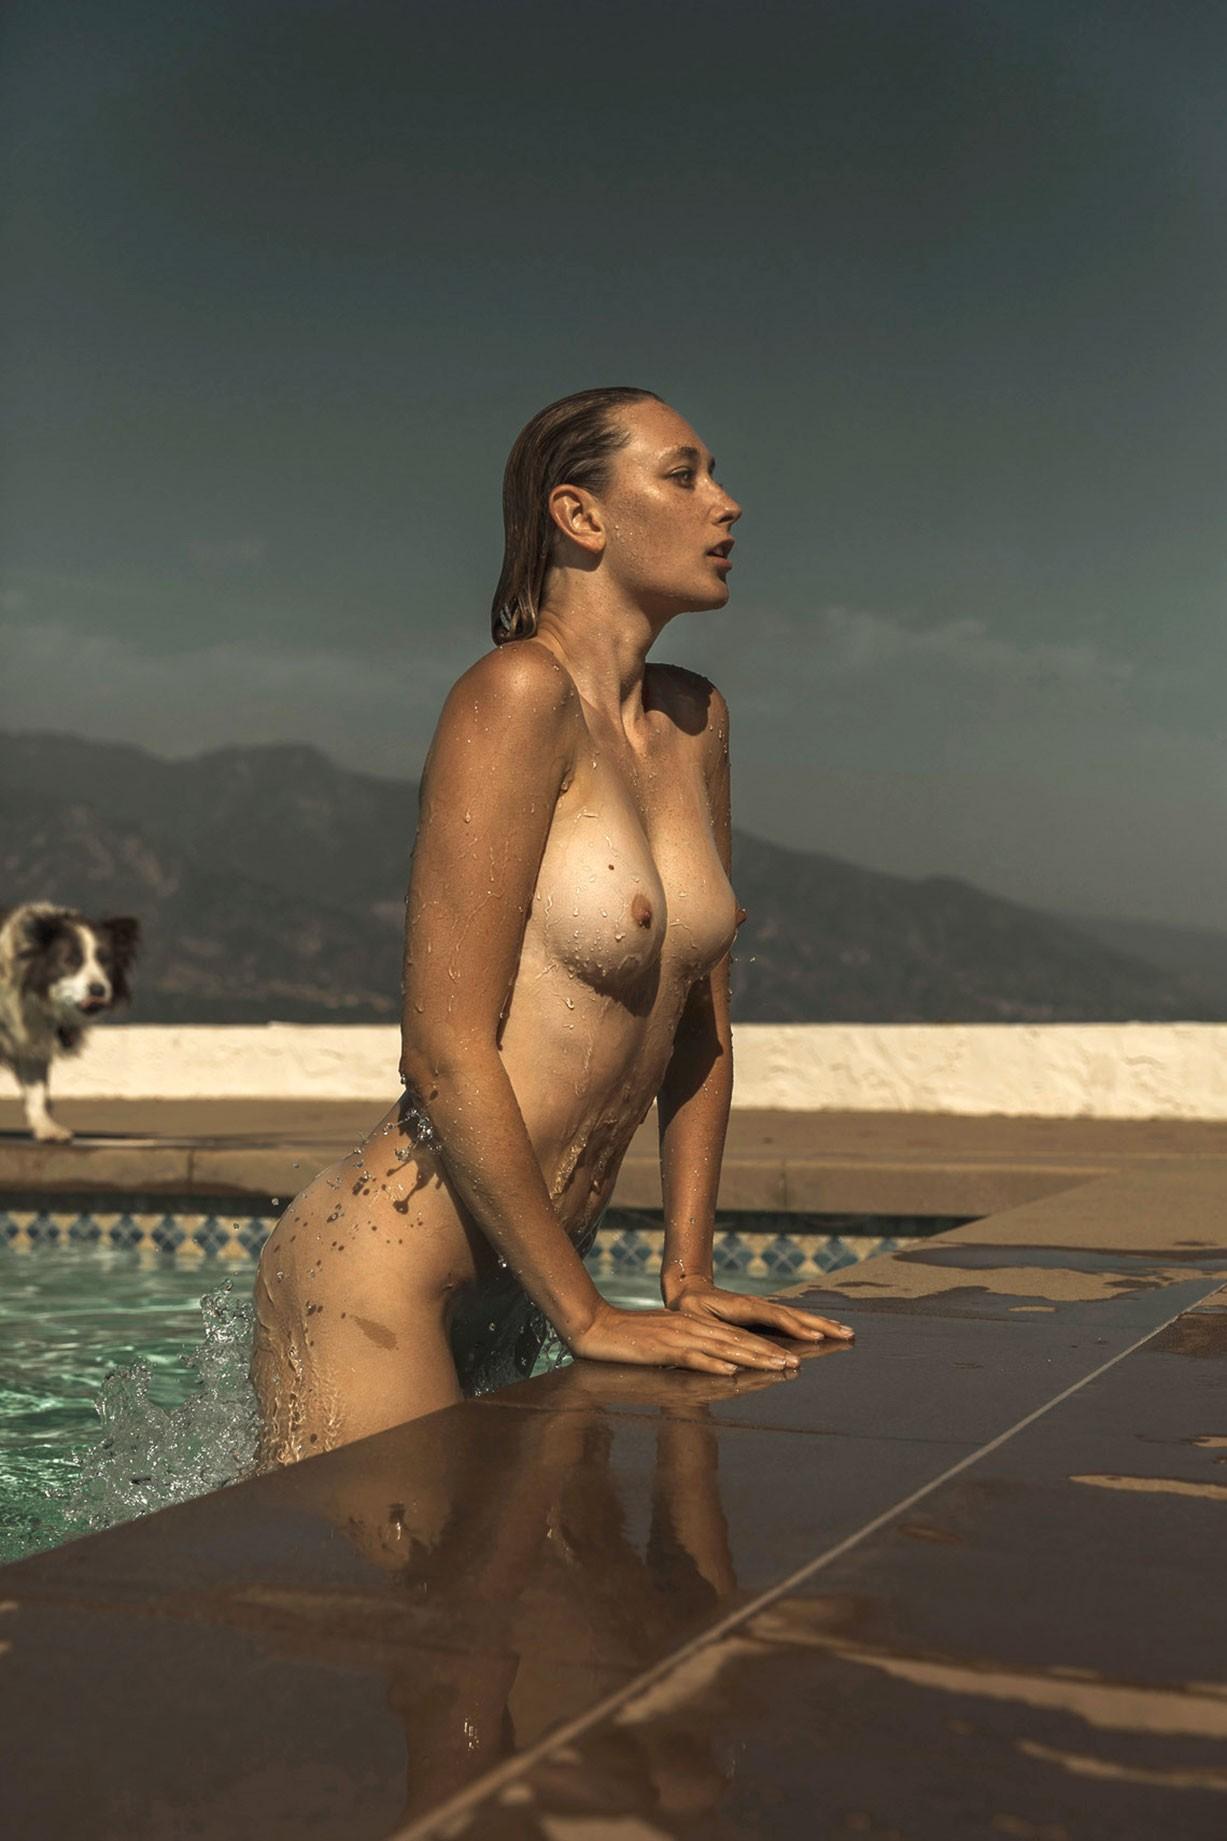 Отдых у бассейна с Брук Санни / Brooke Sanny nude by Miles Schuster - Heatstroke